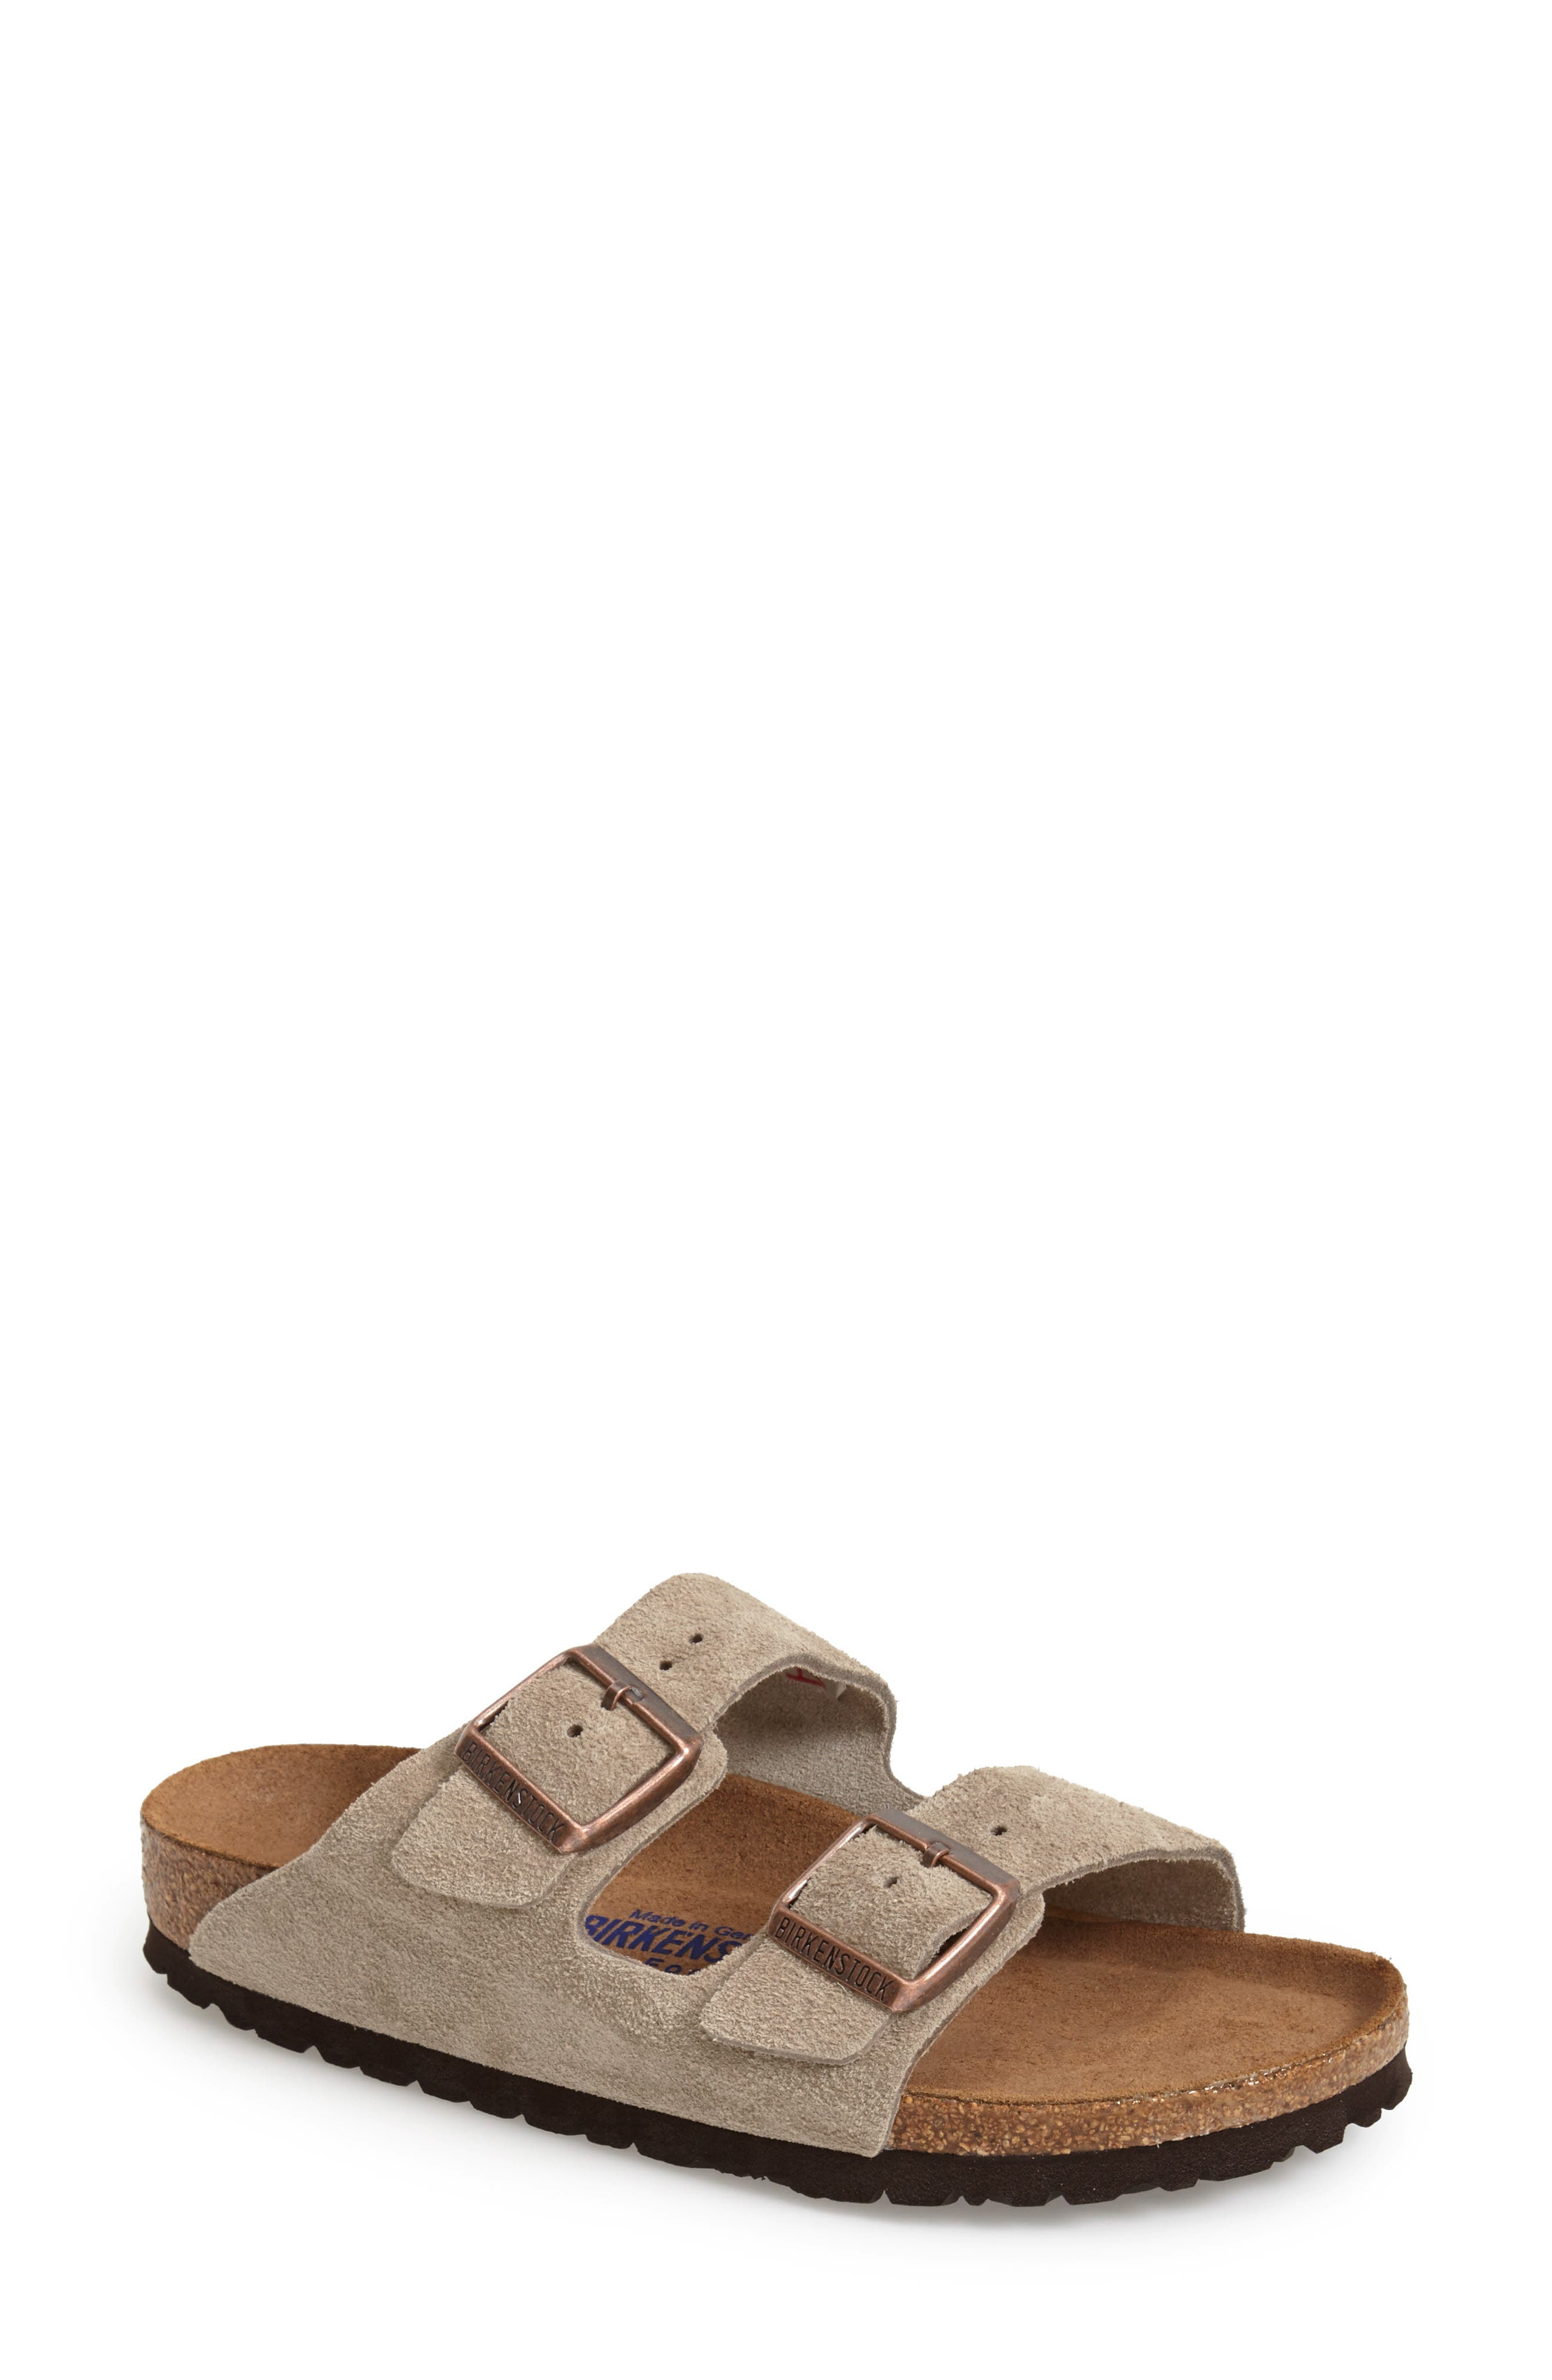 42c5b0687987 Women s Slide Sandals